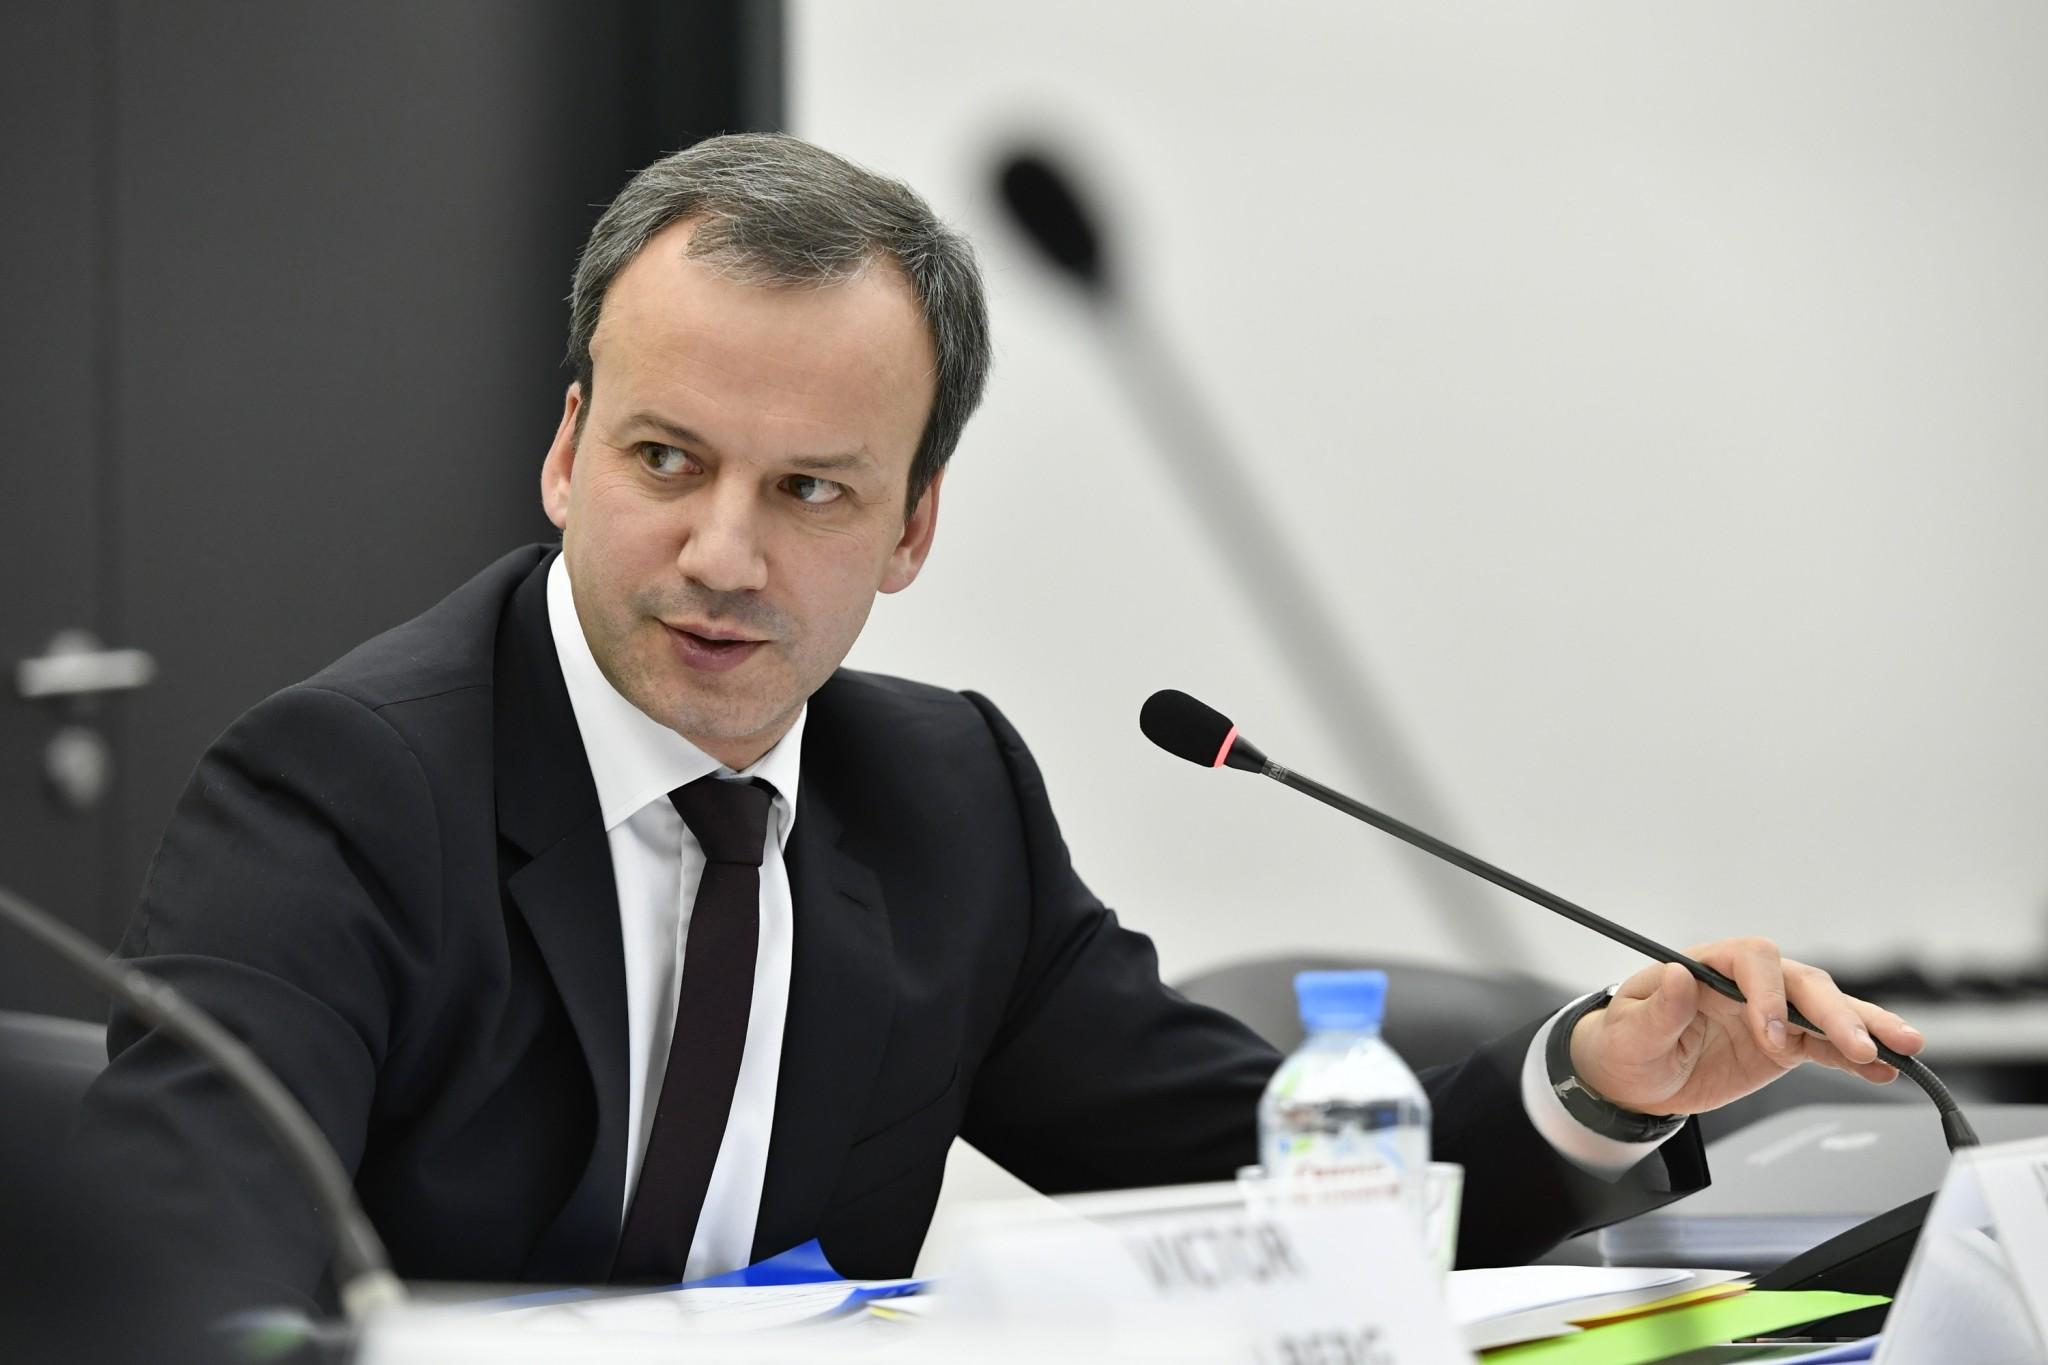 Russian Deputy Prime Minister Arkady Dvorkovich chairs the 27th Skoltech Board of Trustees meeting. Photo: Skoltech.